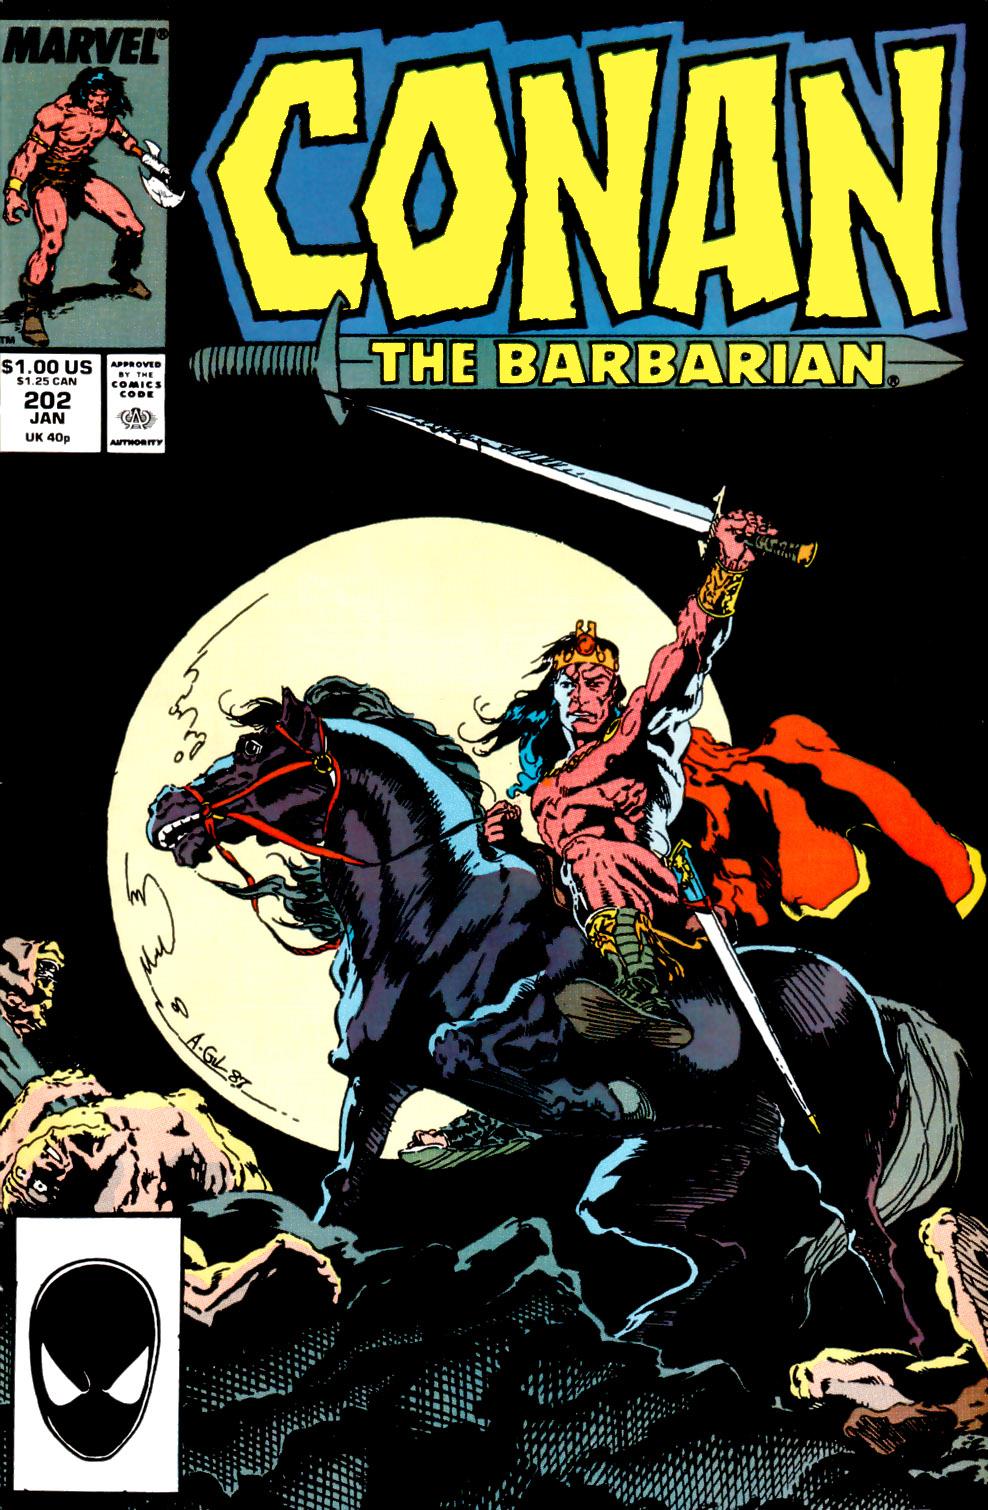 Conan the Barbarian 202